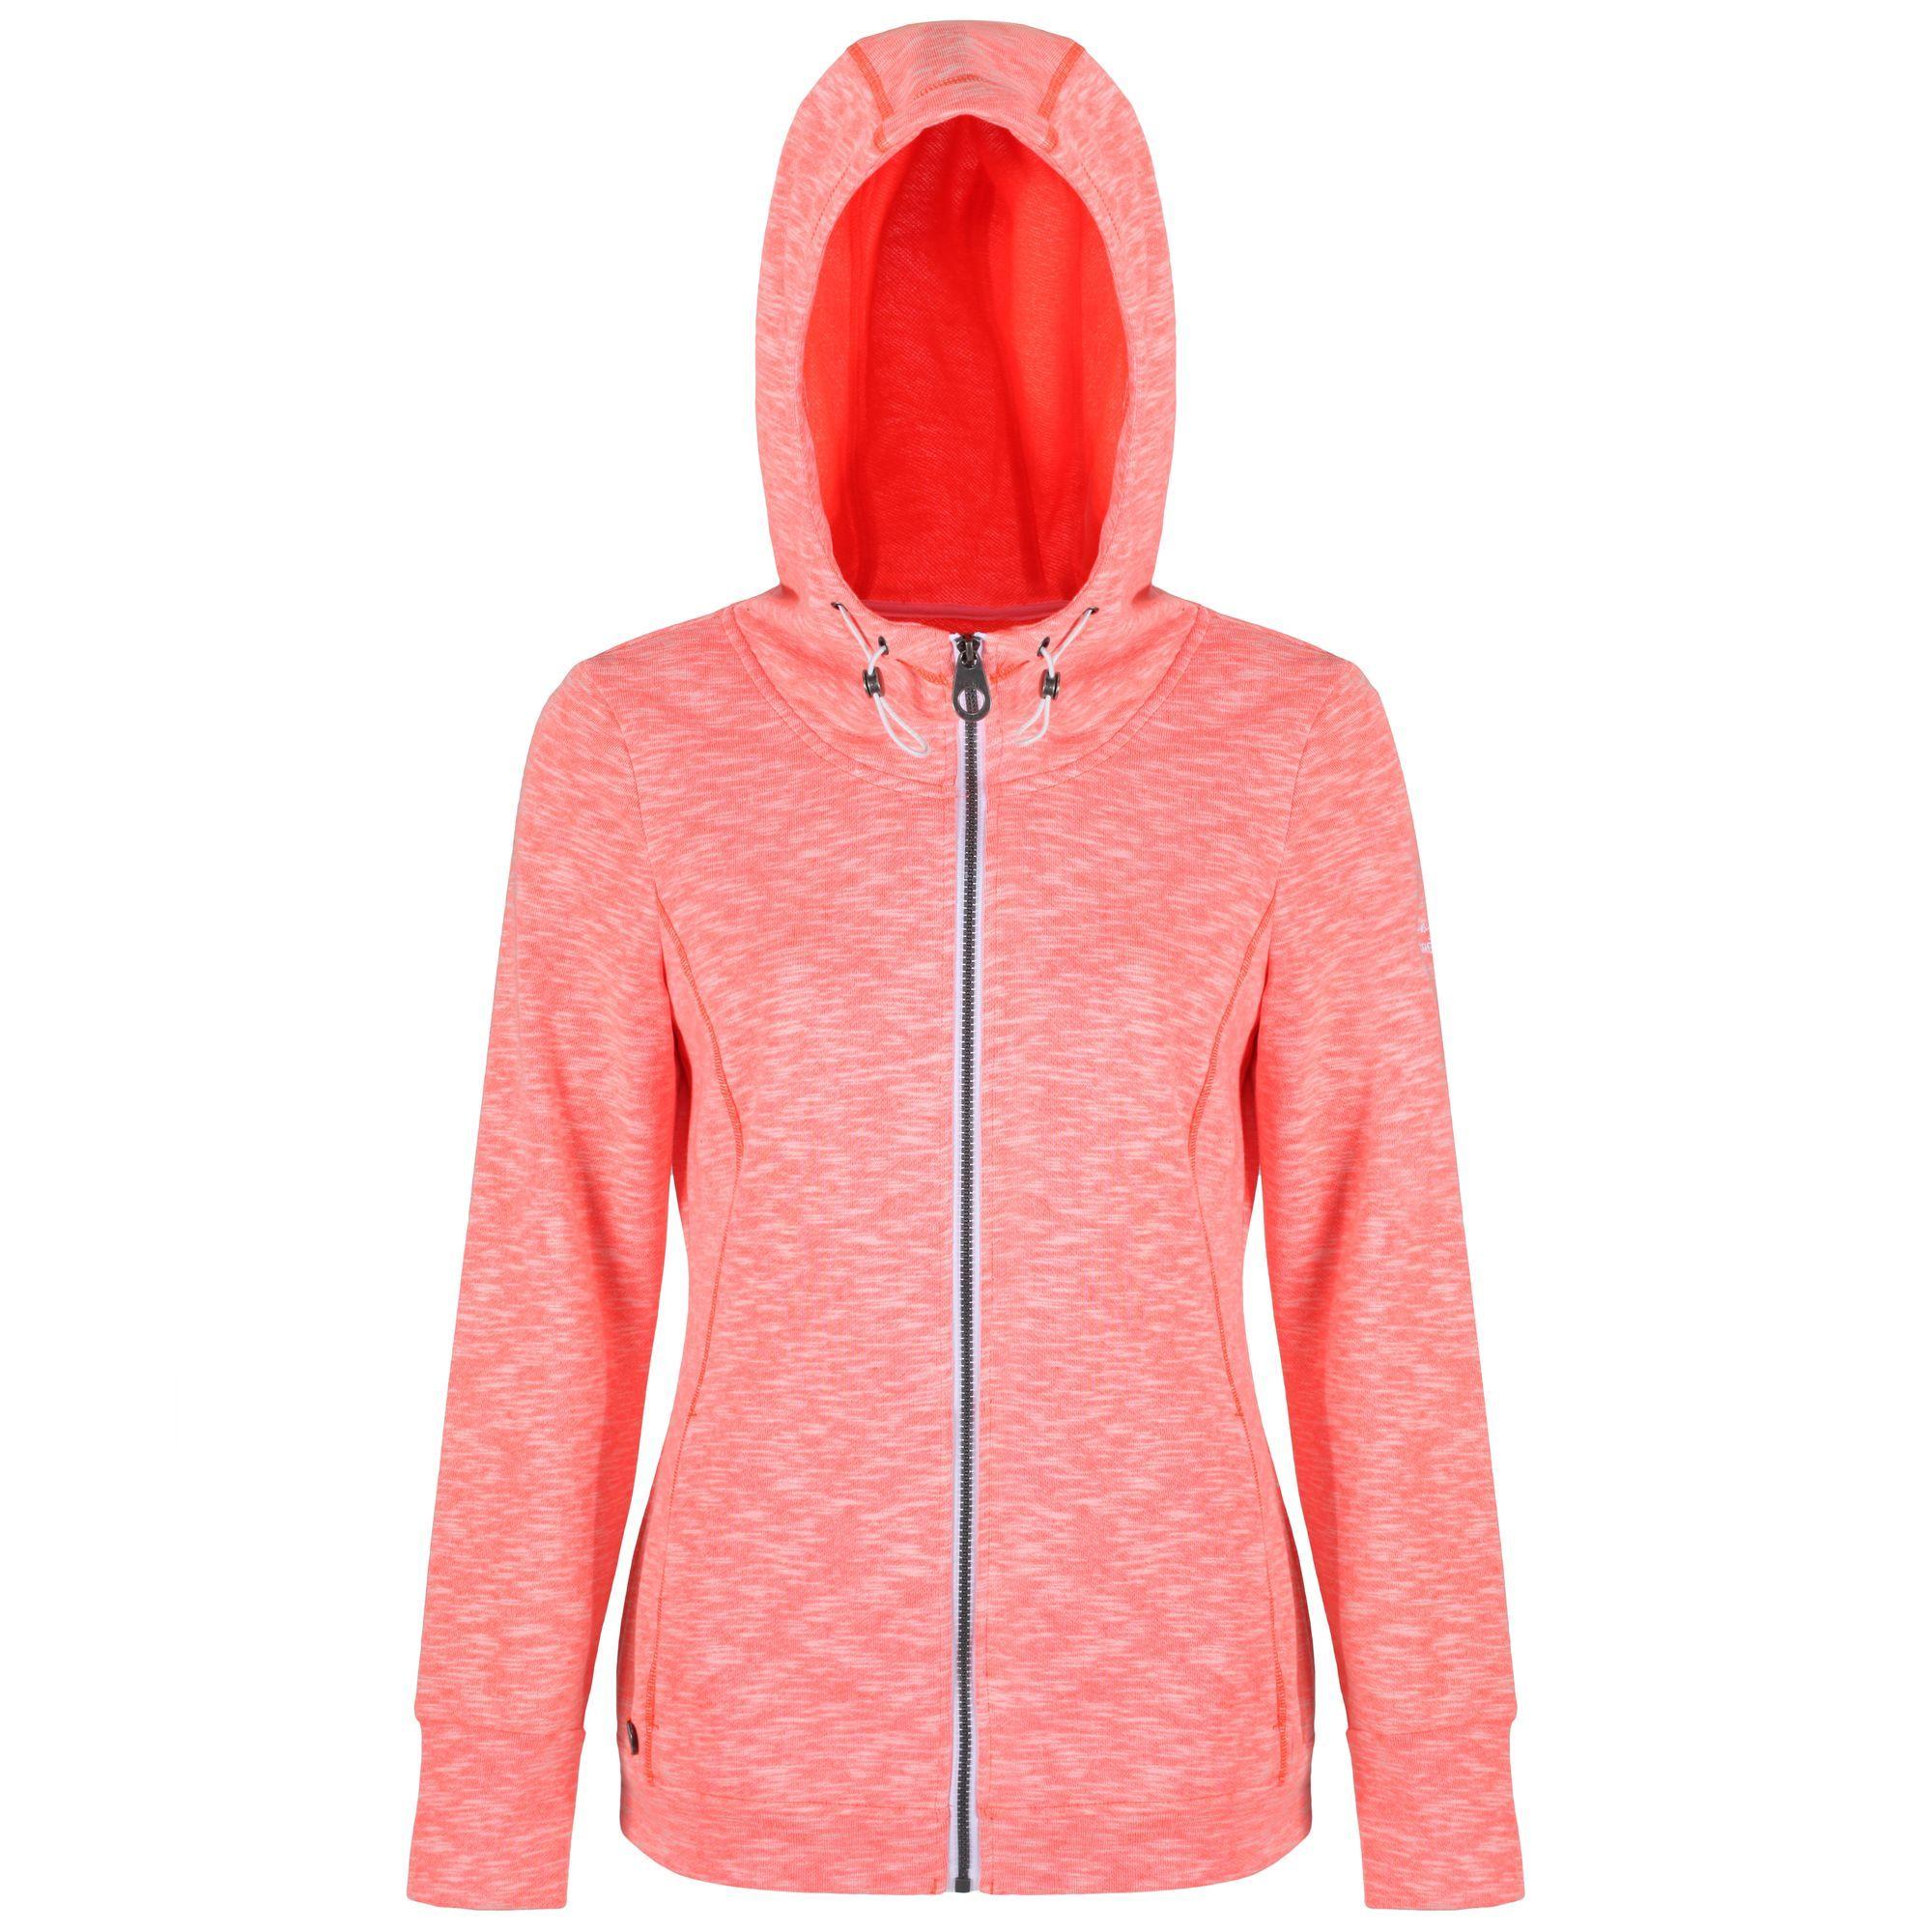 Regatta-Ramosa-Womens-Full-Zip-Hoodie-Hooded-Fleece-Jacket-RRP-50 thumbnail 8